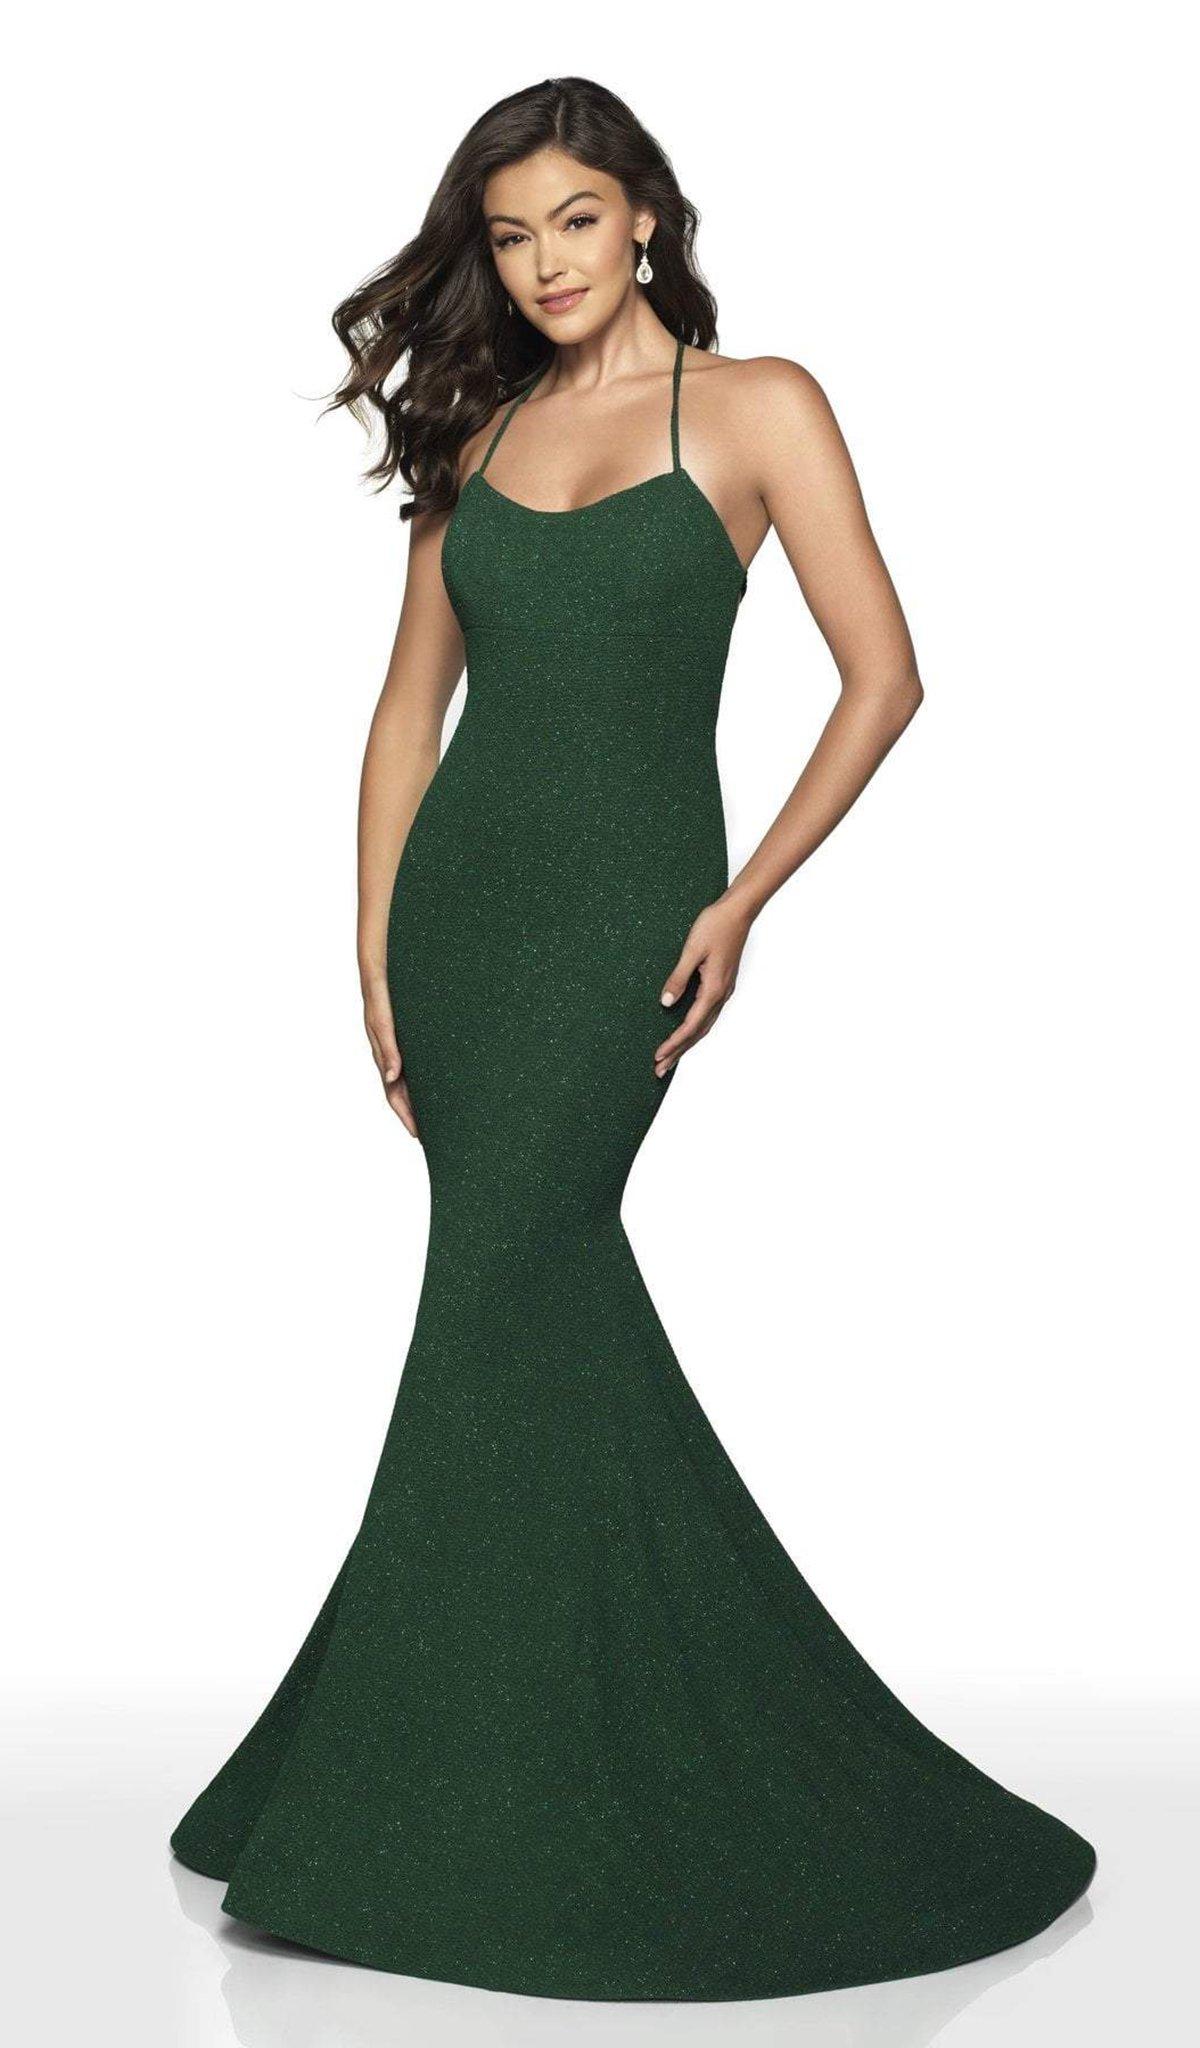 Intrigue by Blush - 518 Halter Glitter Jersey Mermaid Dress